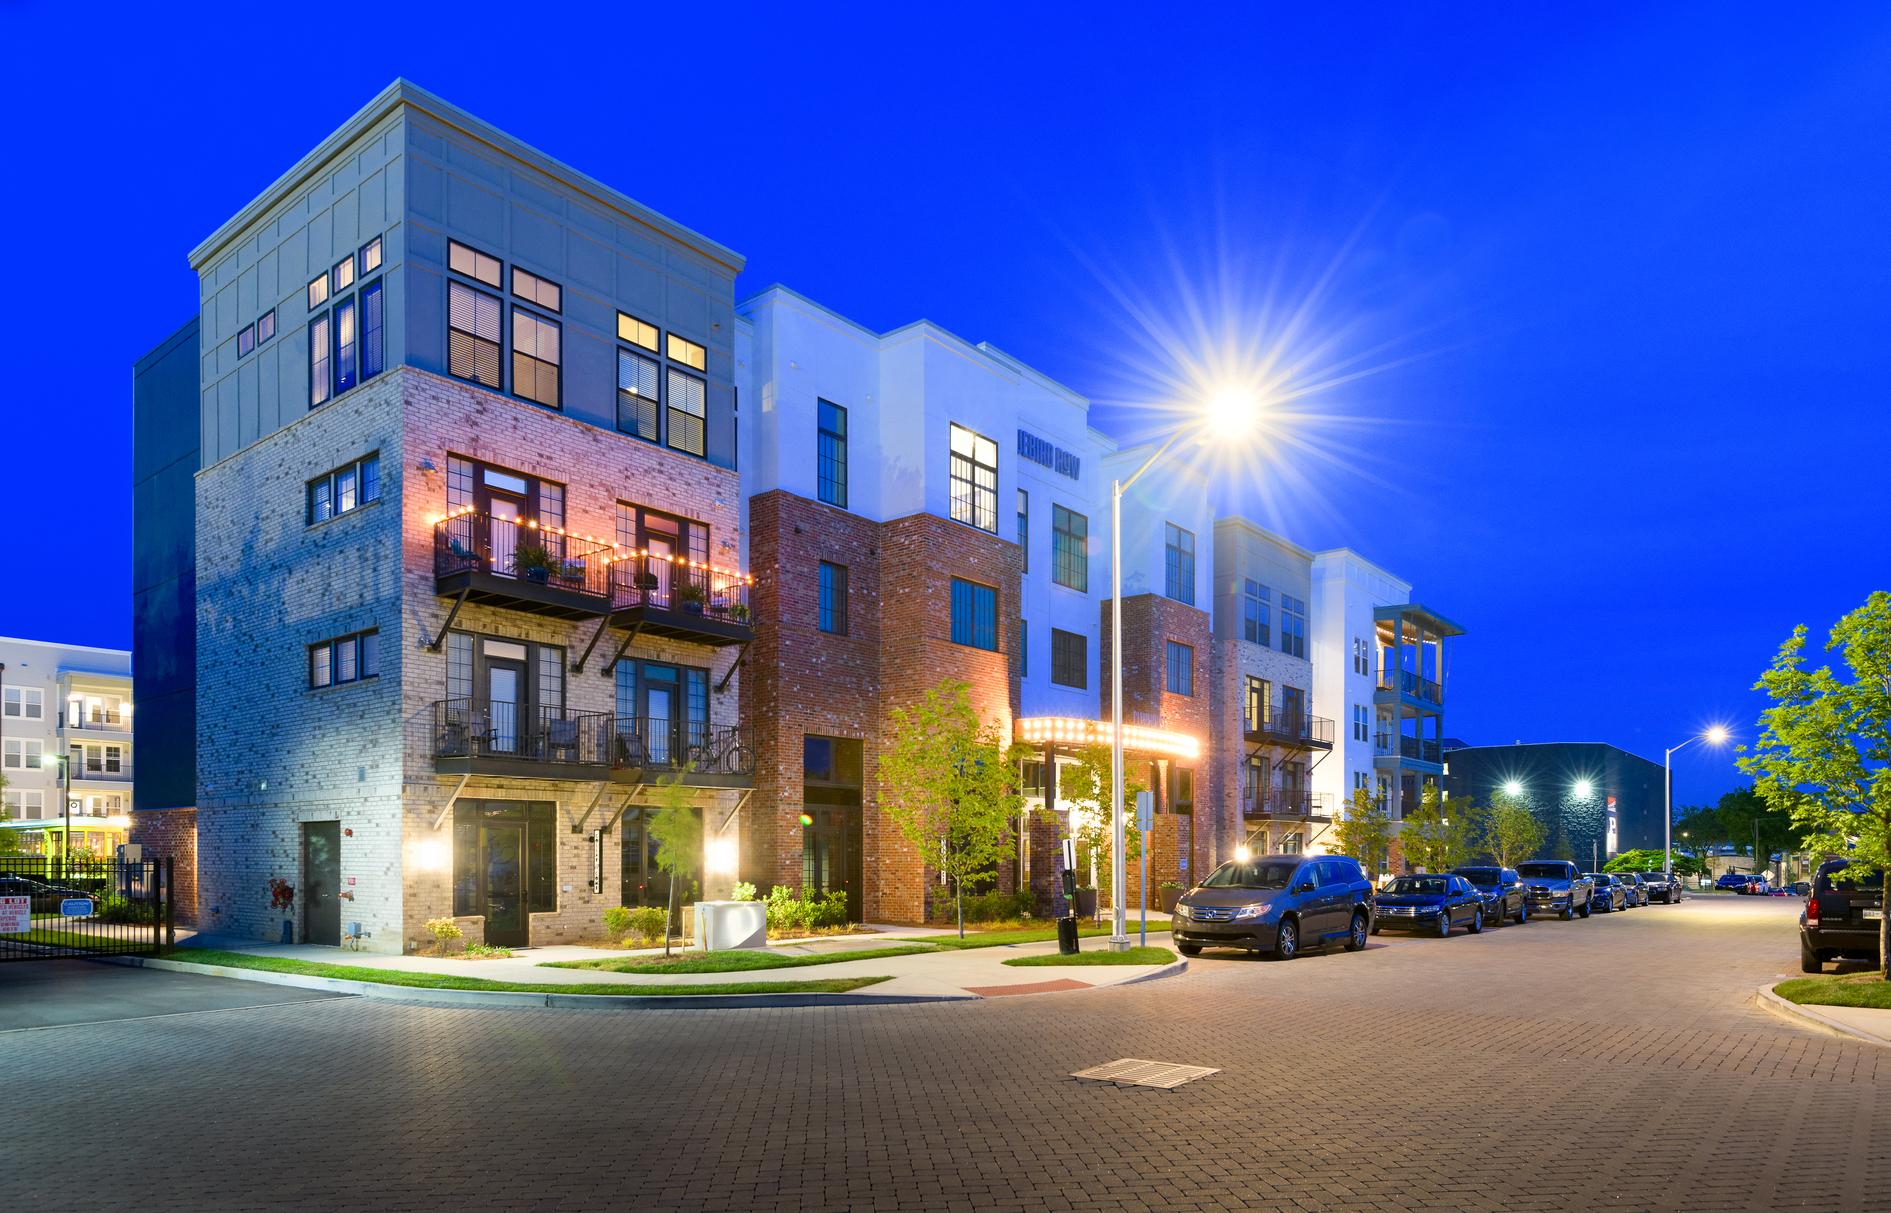 Bluebird Row Apartments